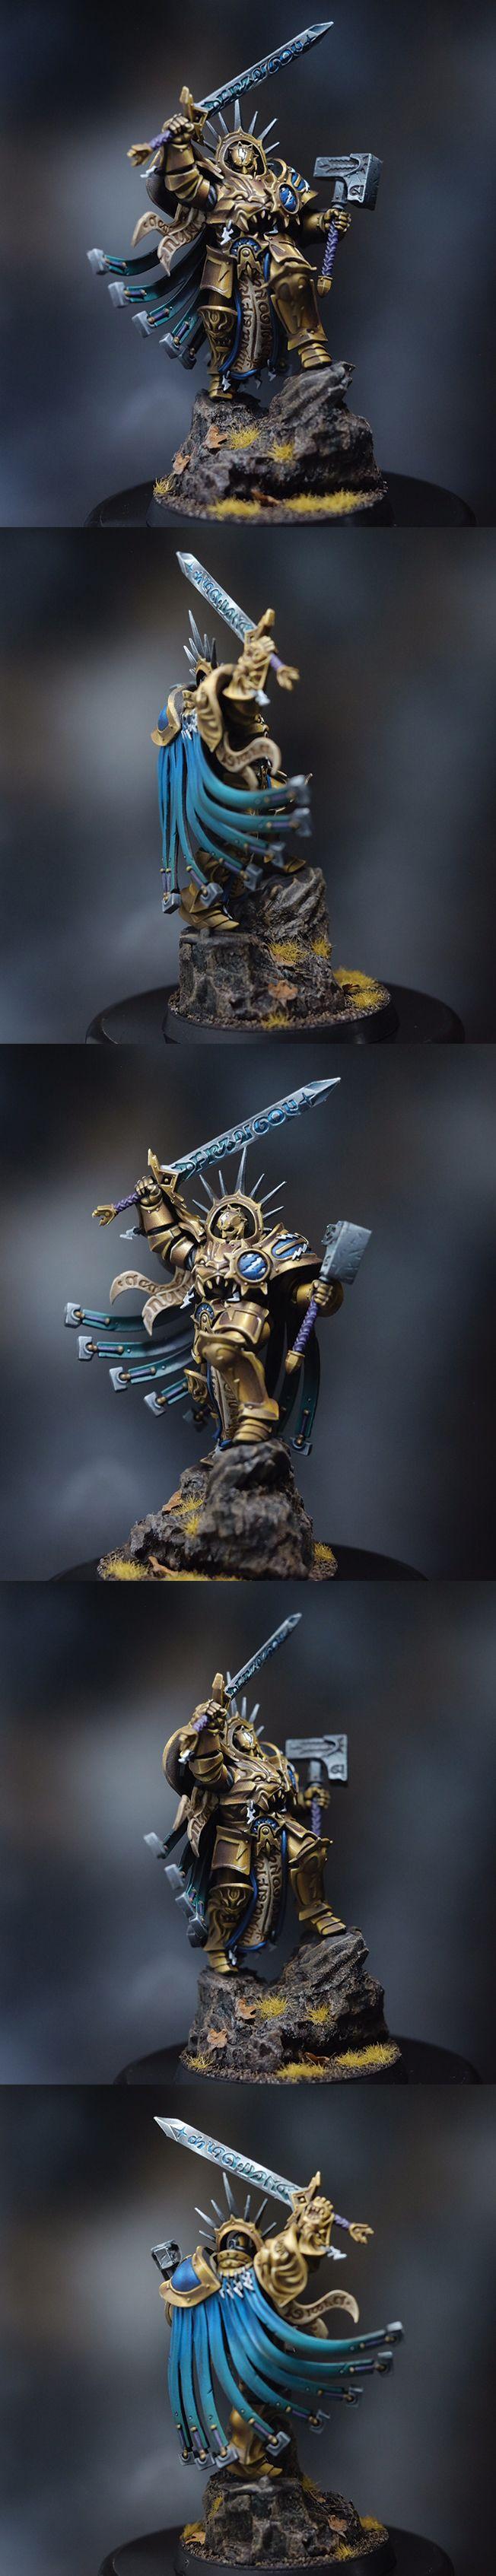 Sigmar Lord Celestant